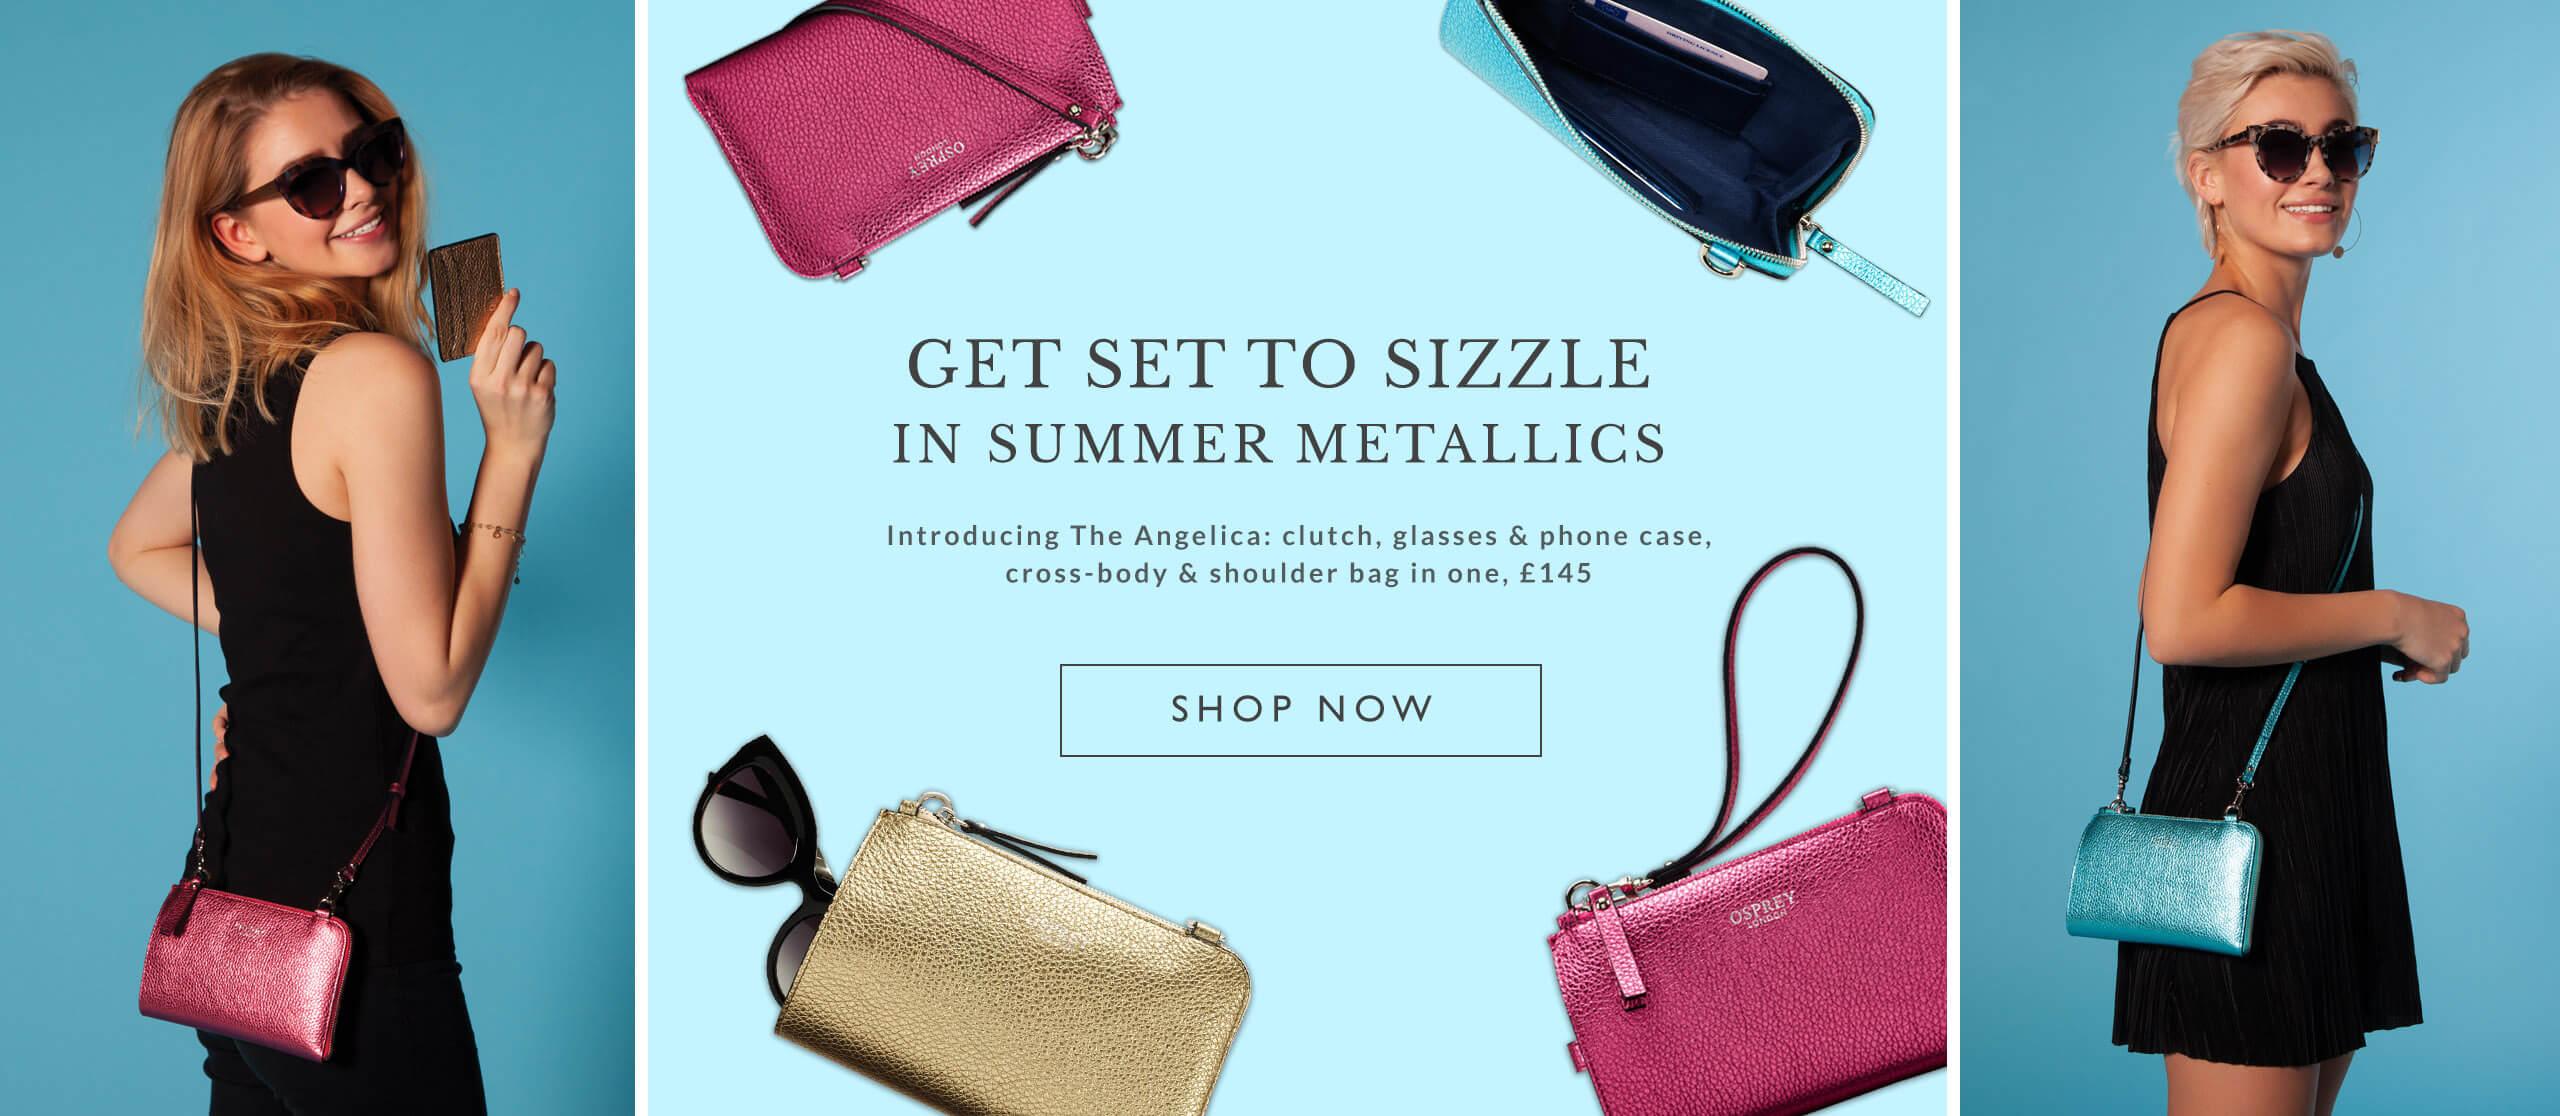 861c0693efd British Luxury Leather Bags, Belts, Purses & Wallets | OSPREY LONDON